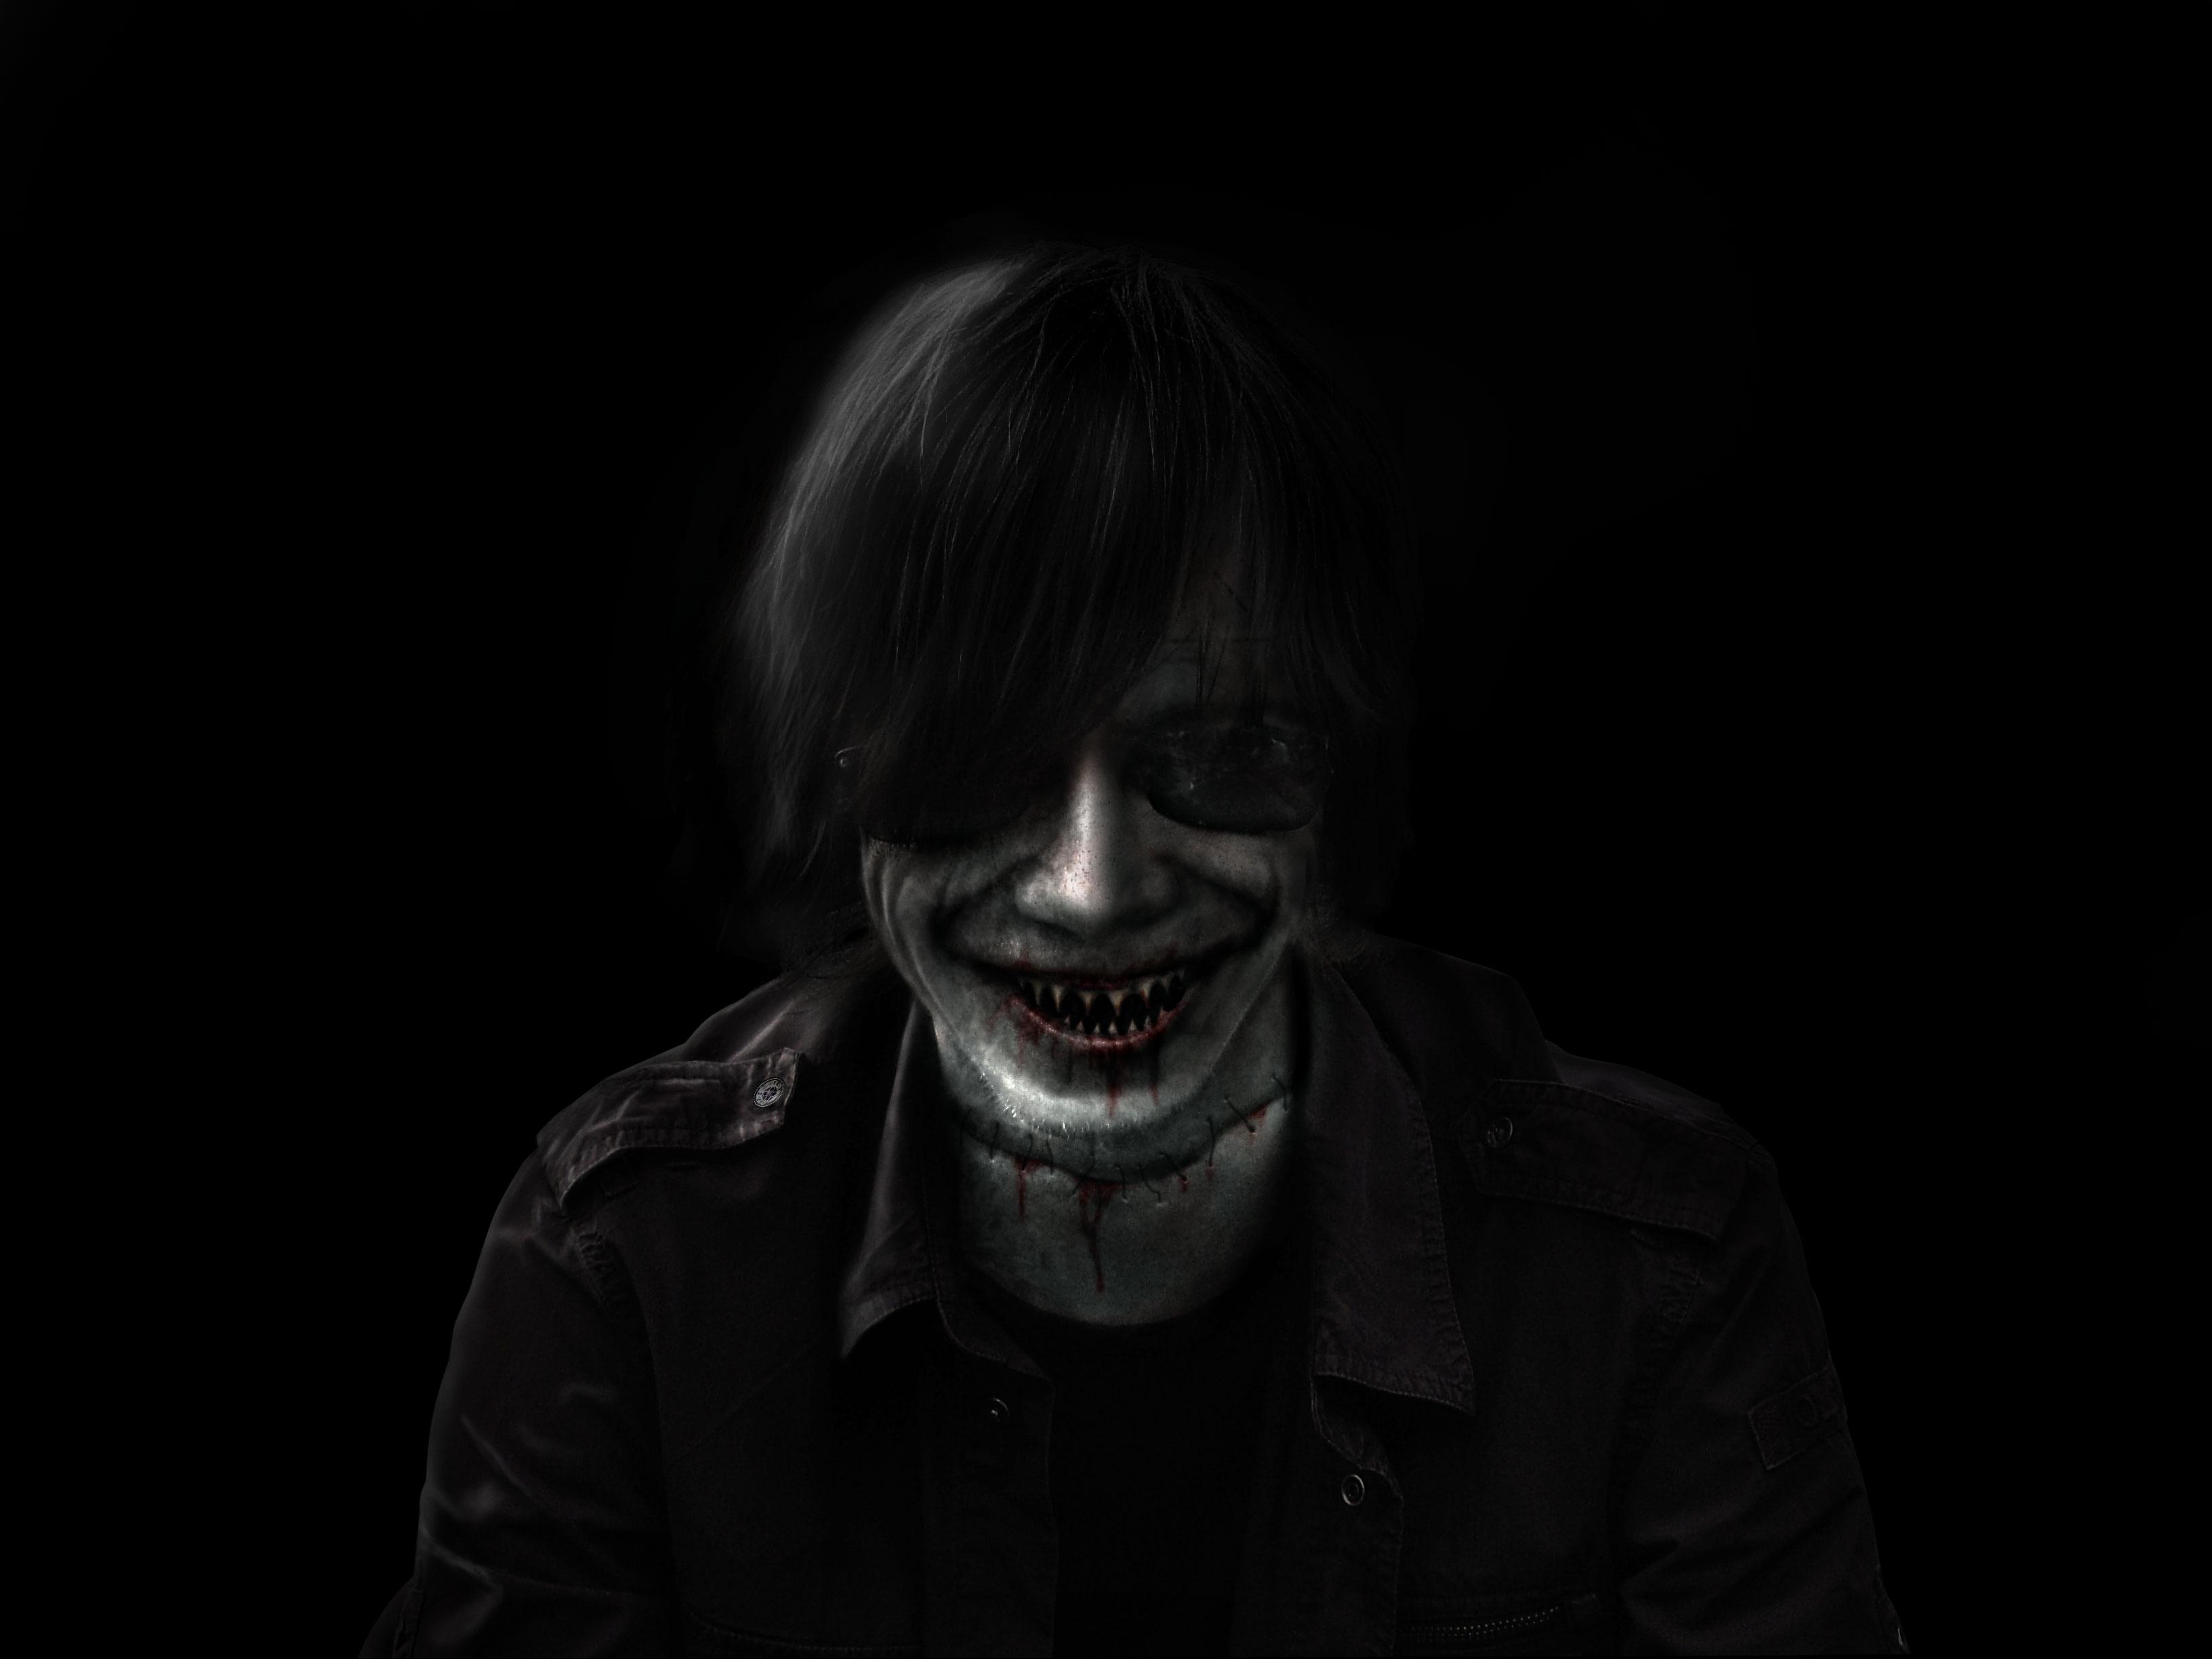 Creepy hd wallpaper background image 3264x2448 id - Dark horror creepy wallpapers ...